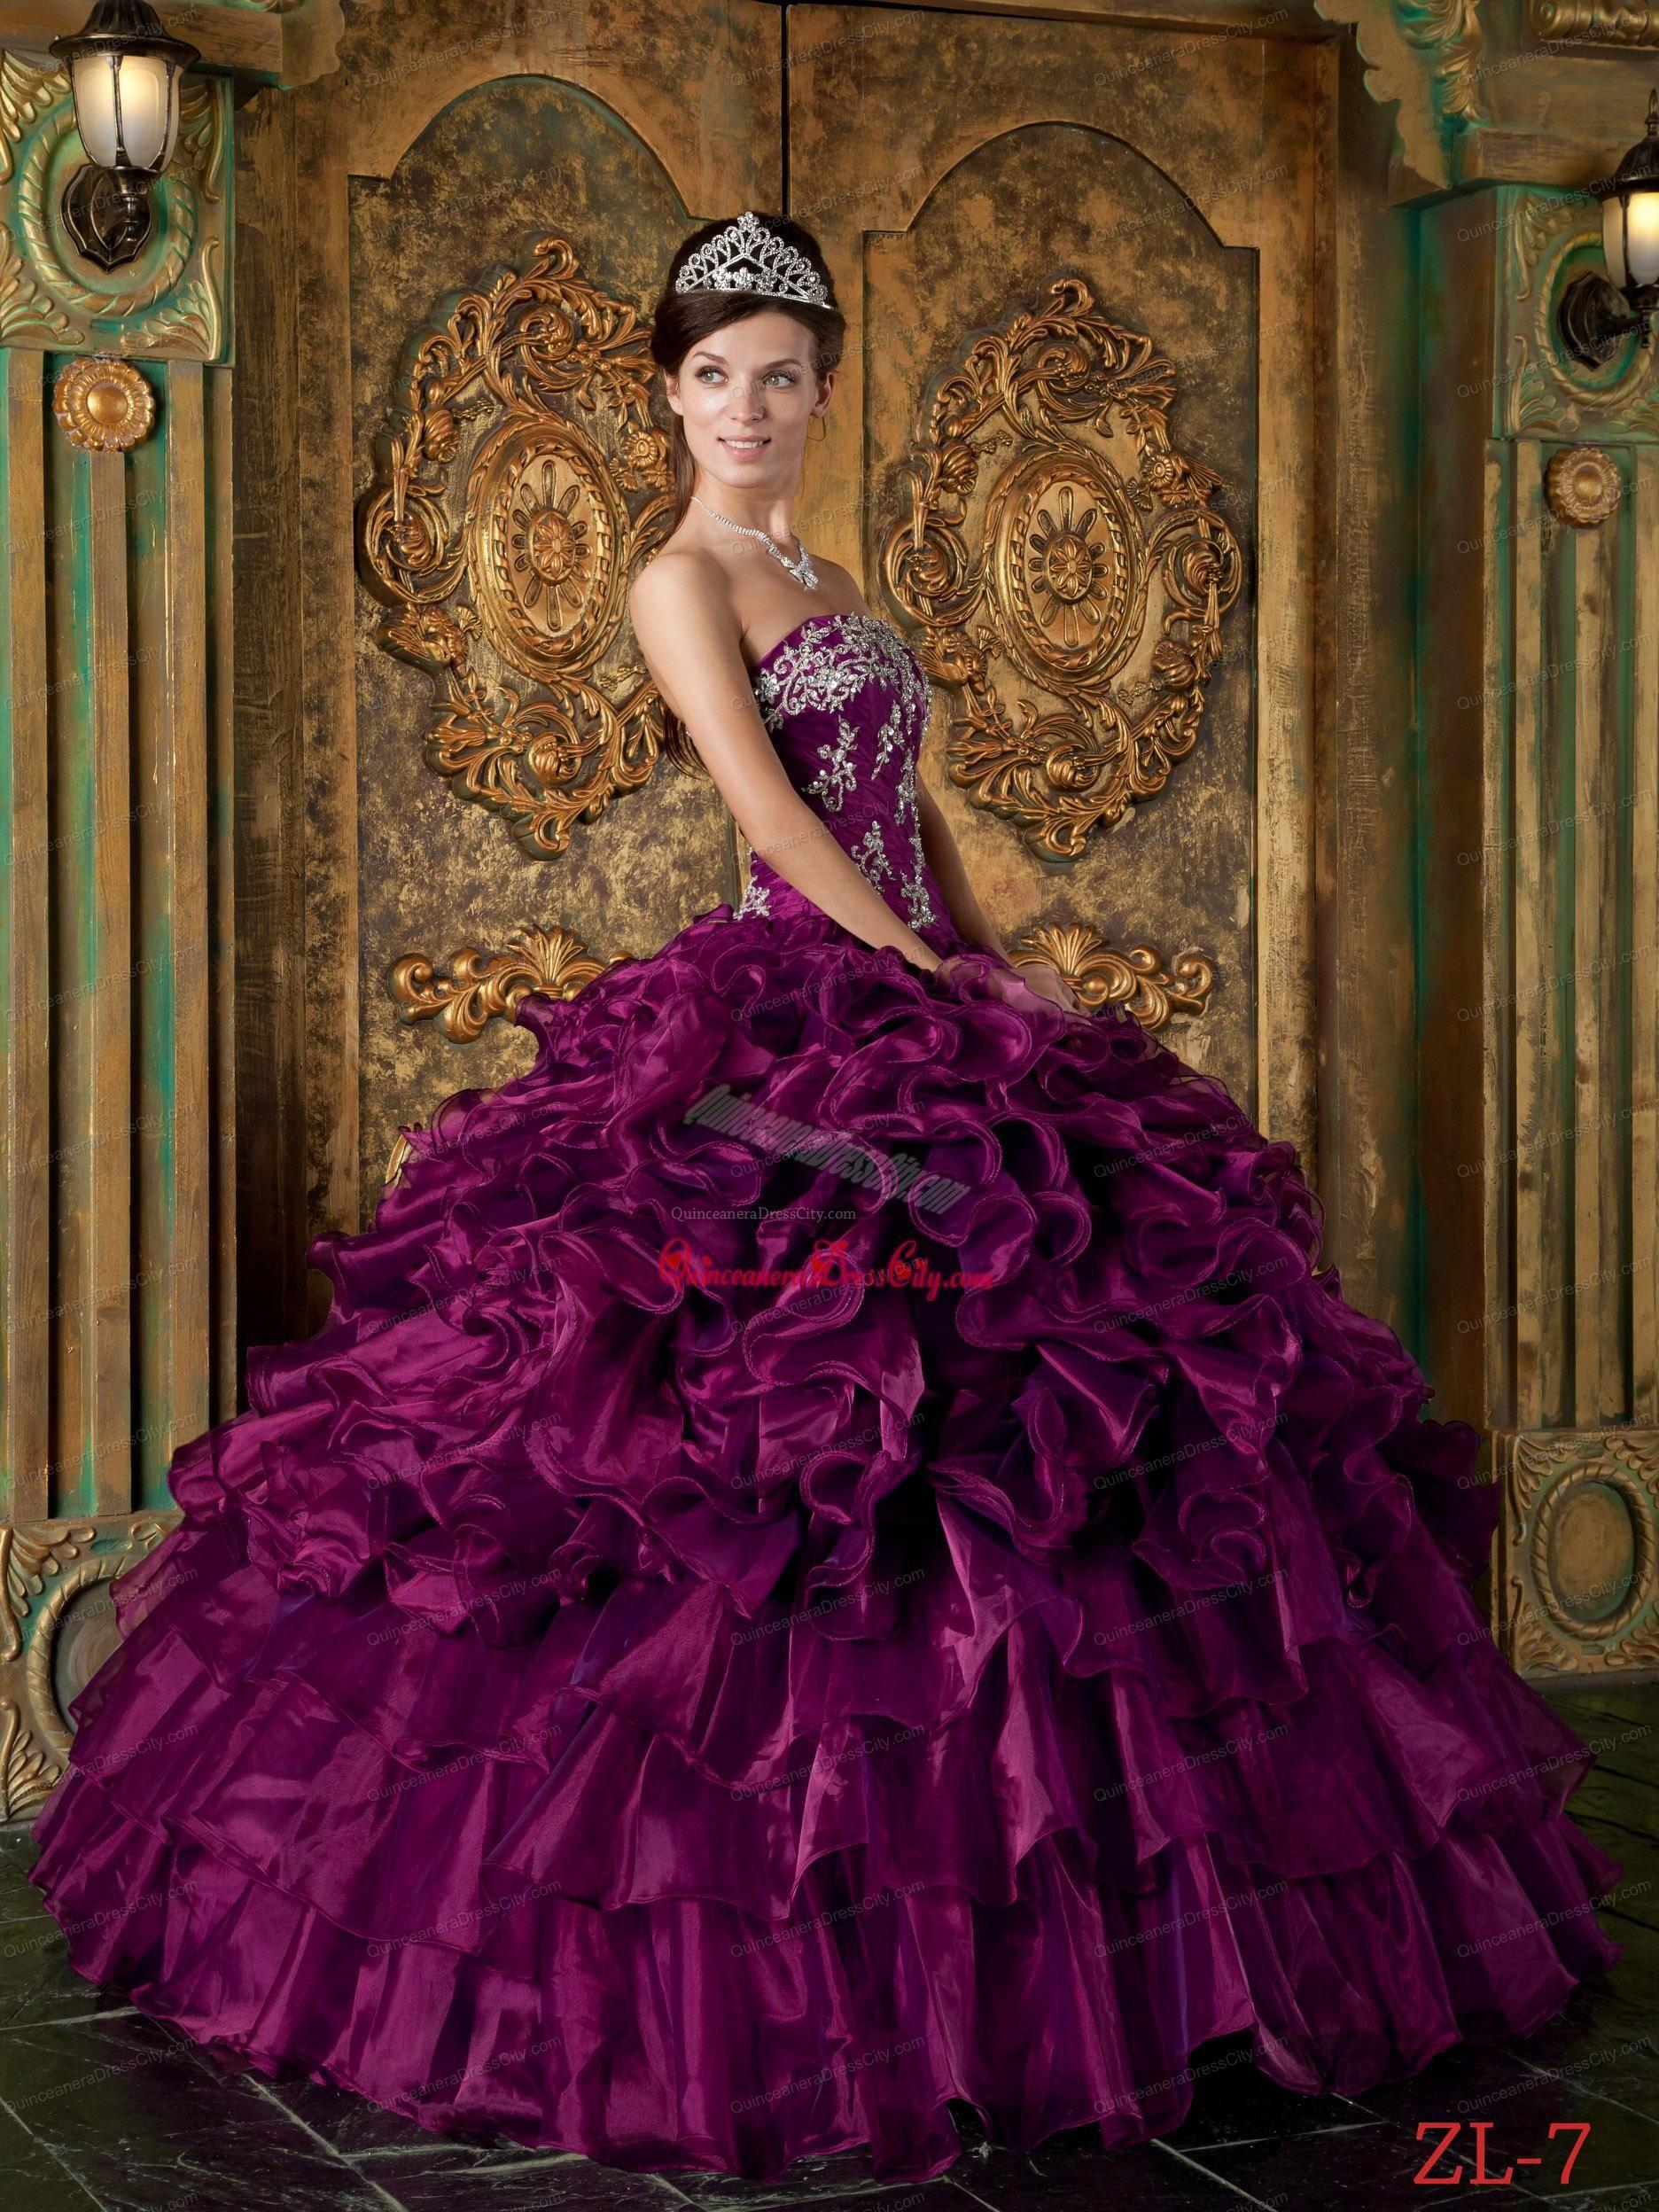 Eggplant Purple Ball Gown Strapless Floor-length Organza Ruffles Quinceanera  Dress. 5cb874c015a6